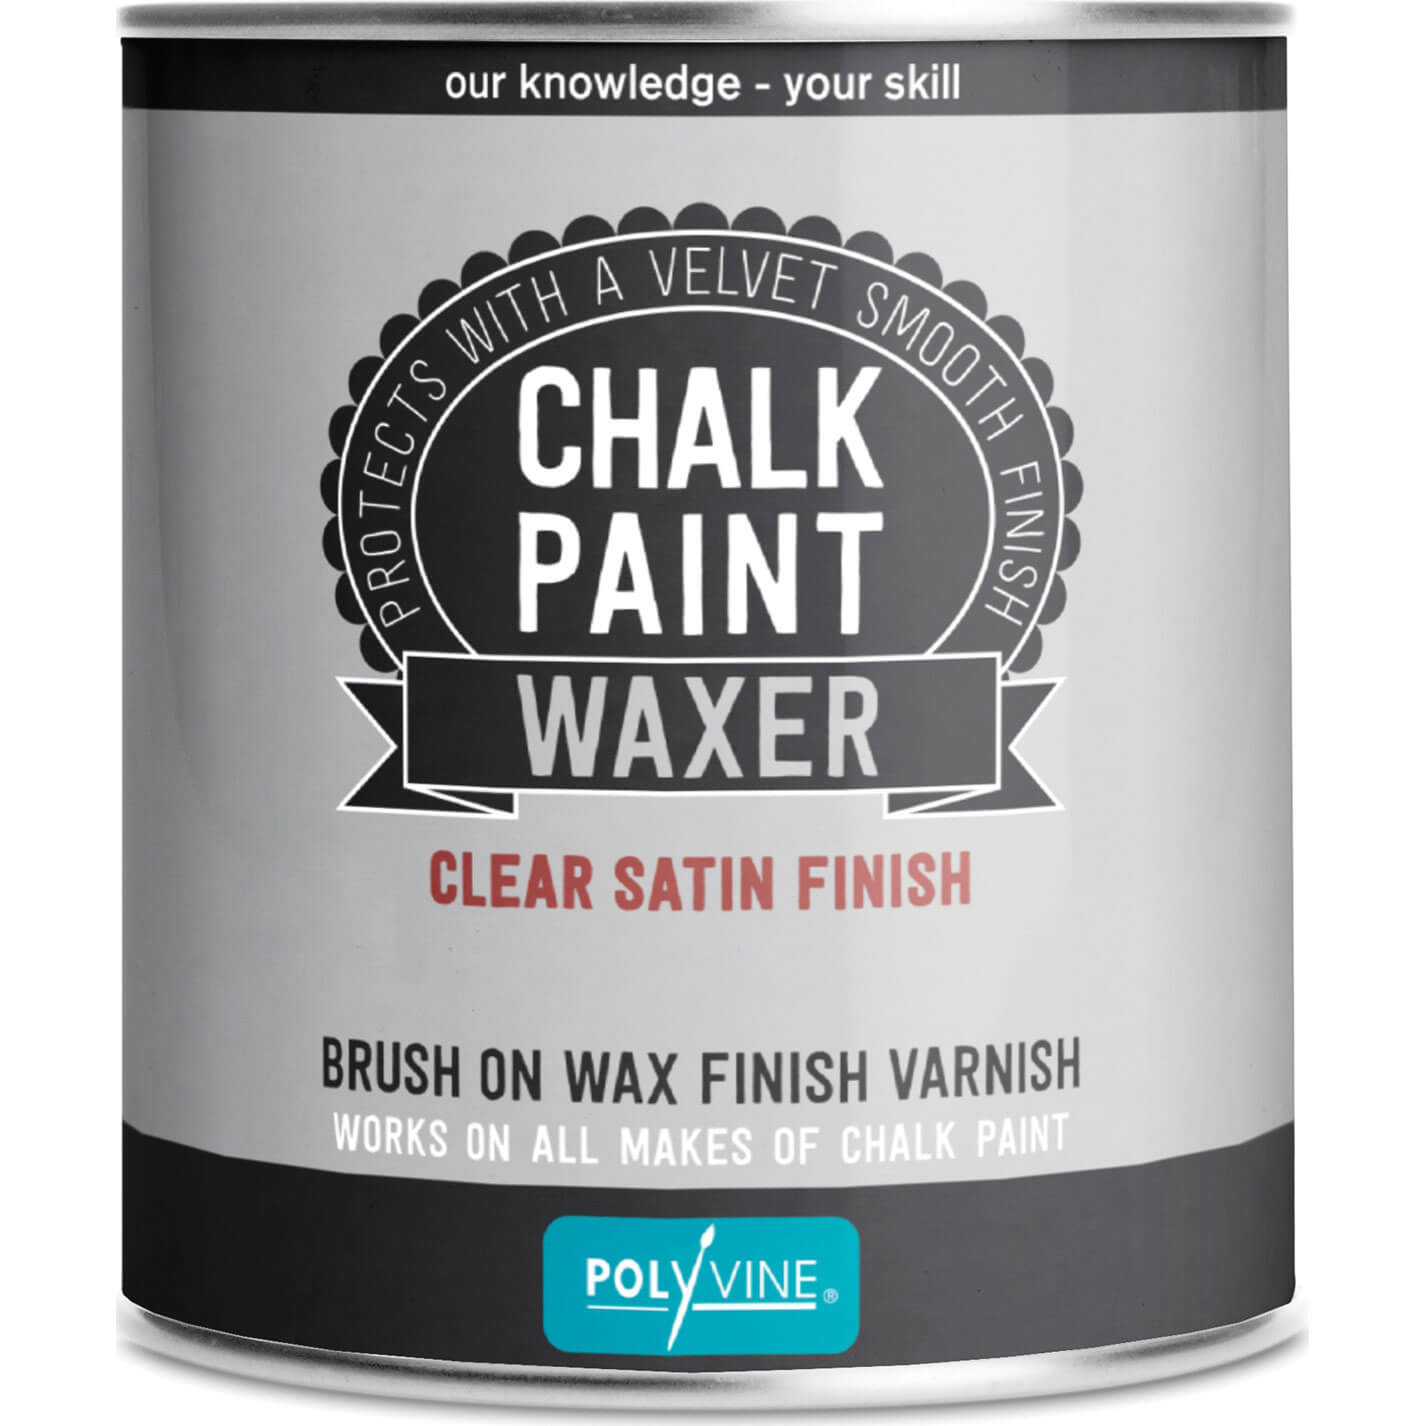 Image of Polyvine Chalk Paint Waxer Satin Finish 500ml